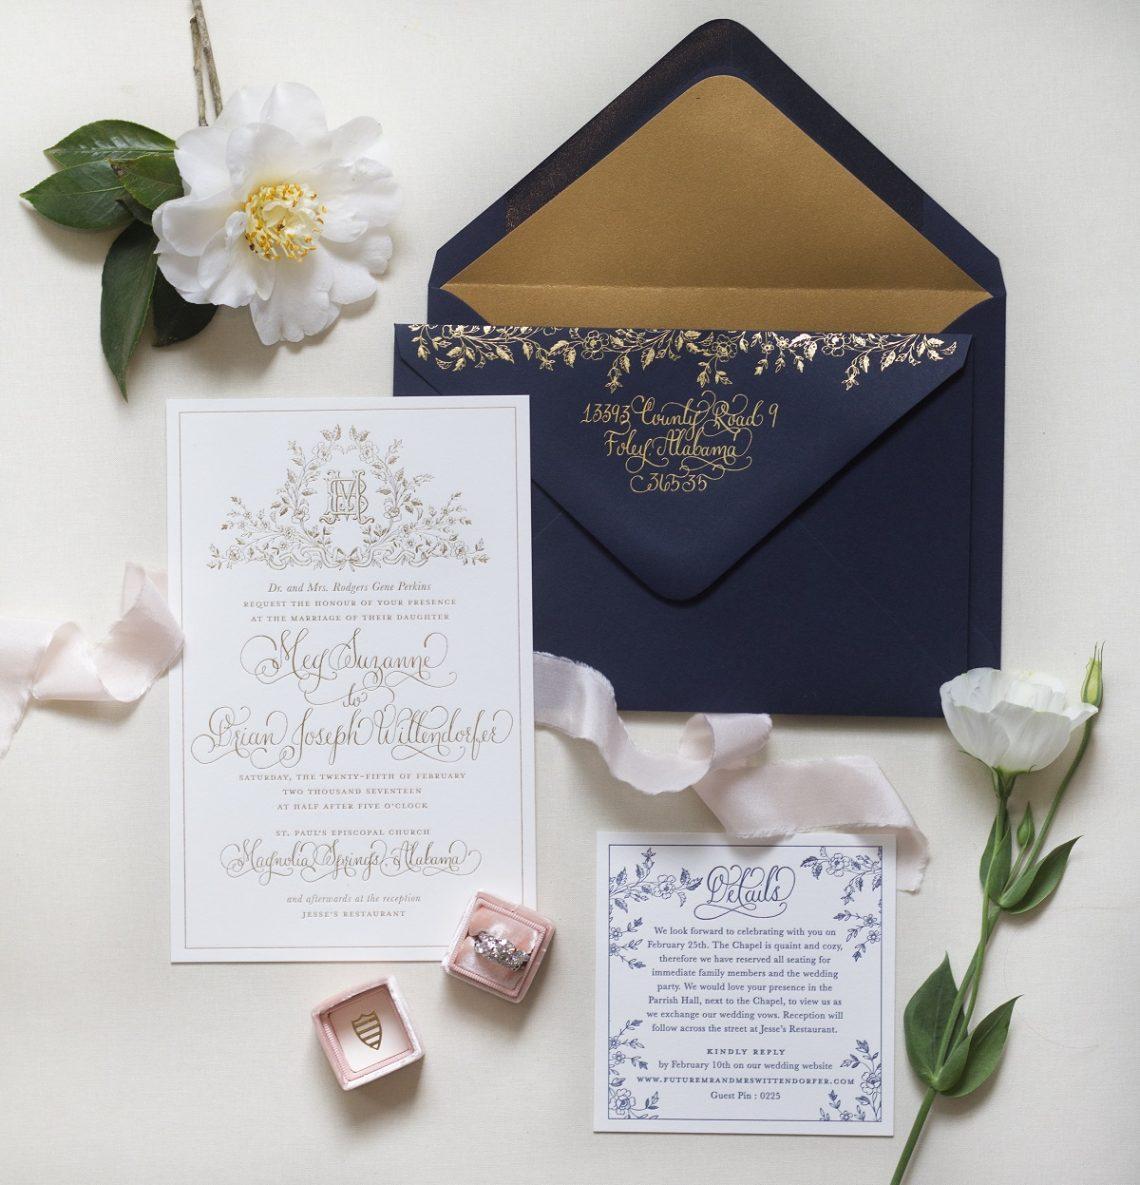 Trebuie sa le trimiti si parintilor invitatie la nunta?